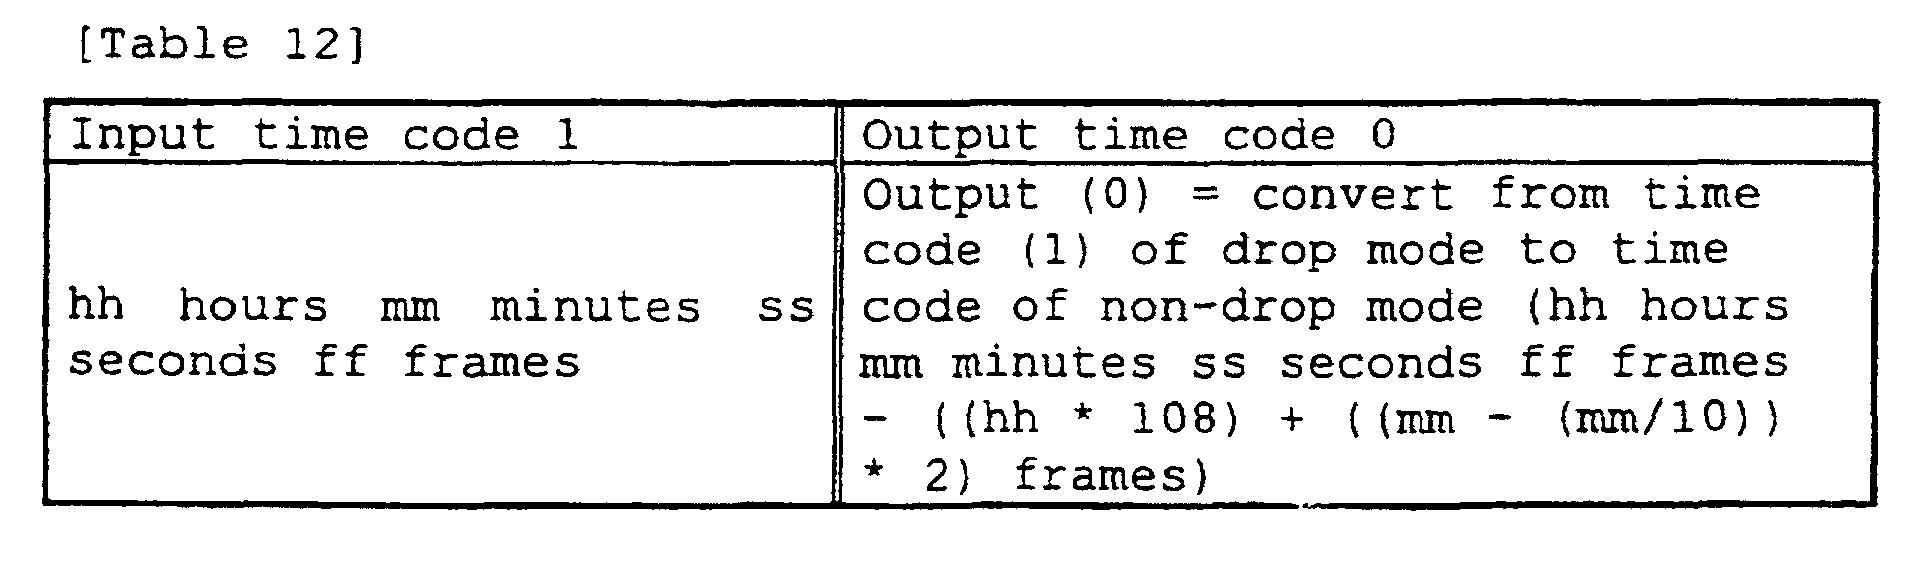 EP1078367B1 - Time code arithmetic apparatus - Google Patents